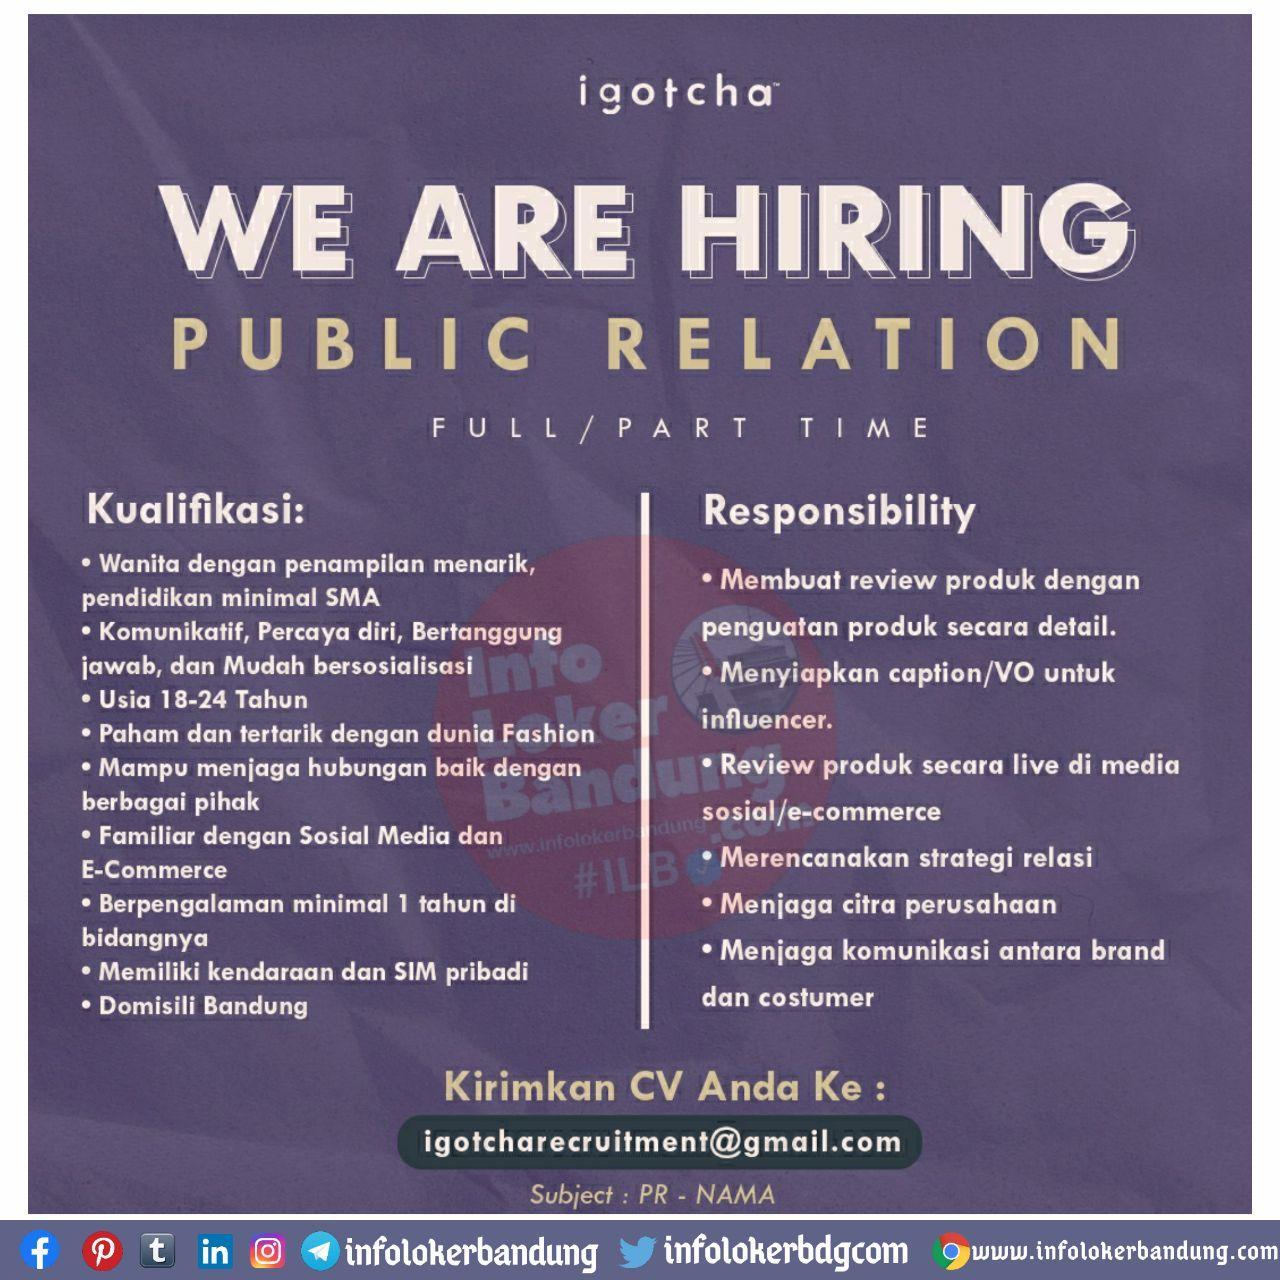 Lowongan Kerja Full & Part Time Public Relation Igotcha Bandung Oktober 2020